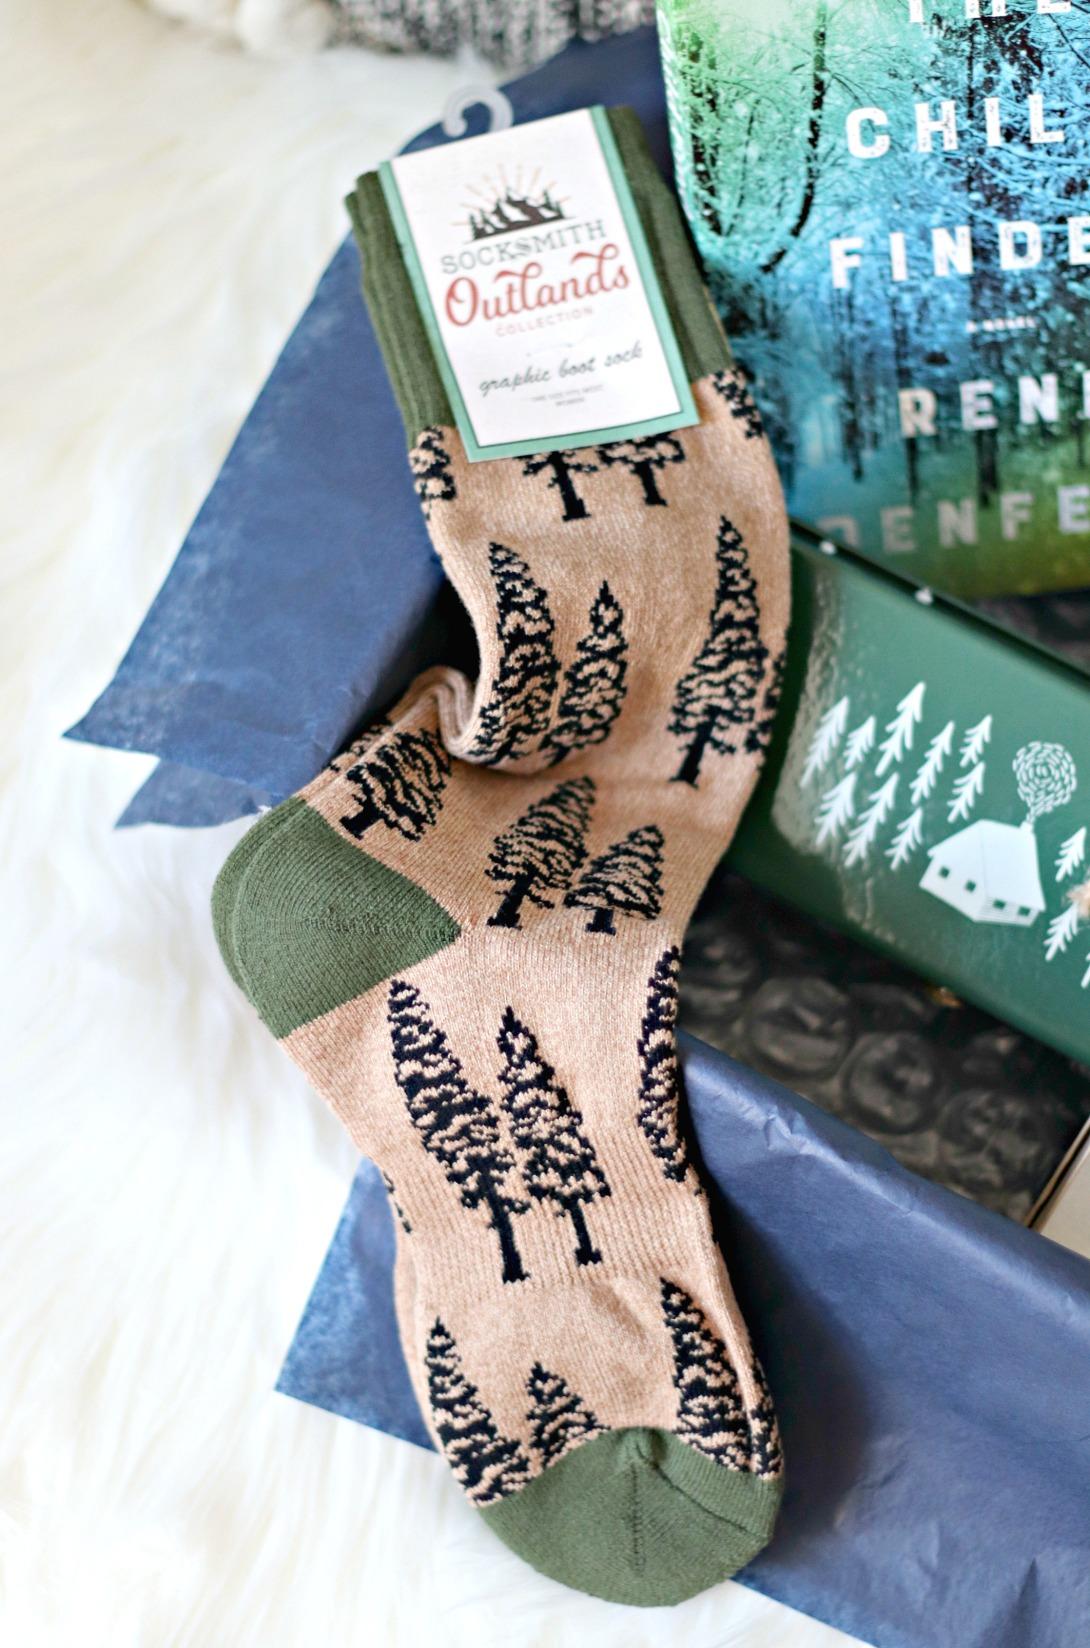 Sweet Reads Box Outlands Tree Socks